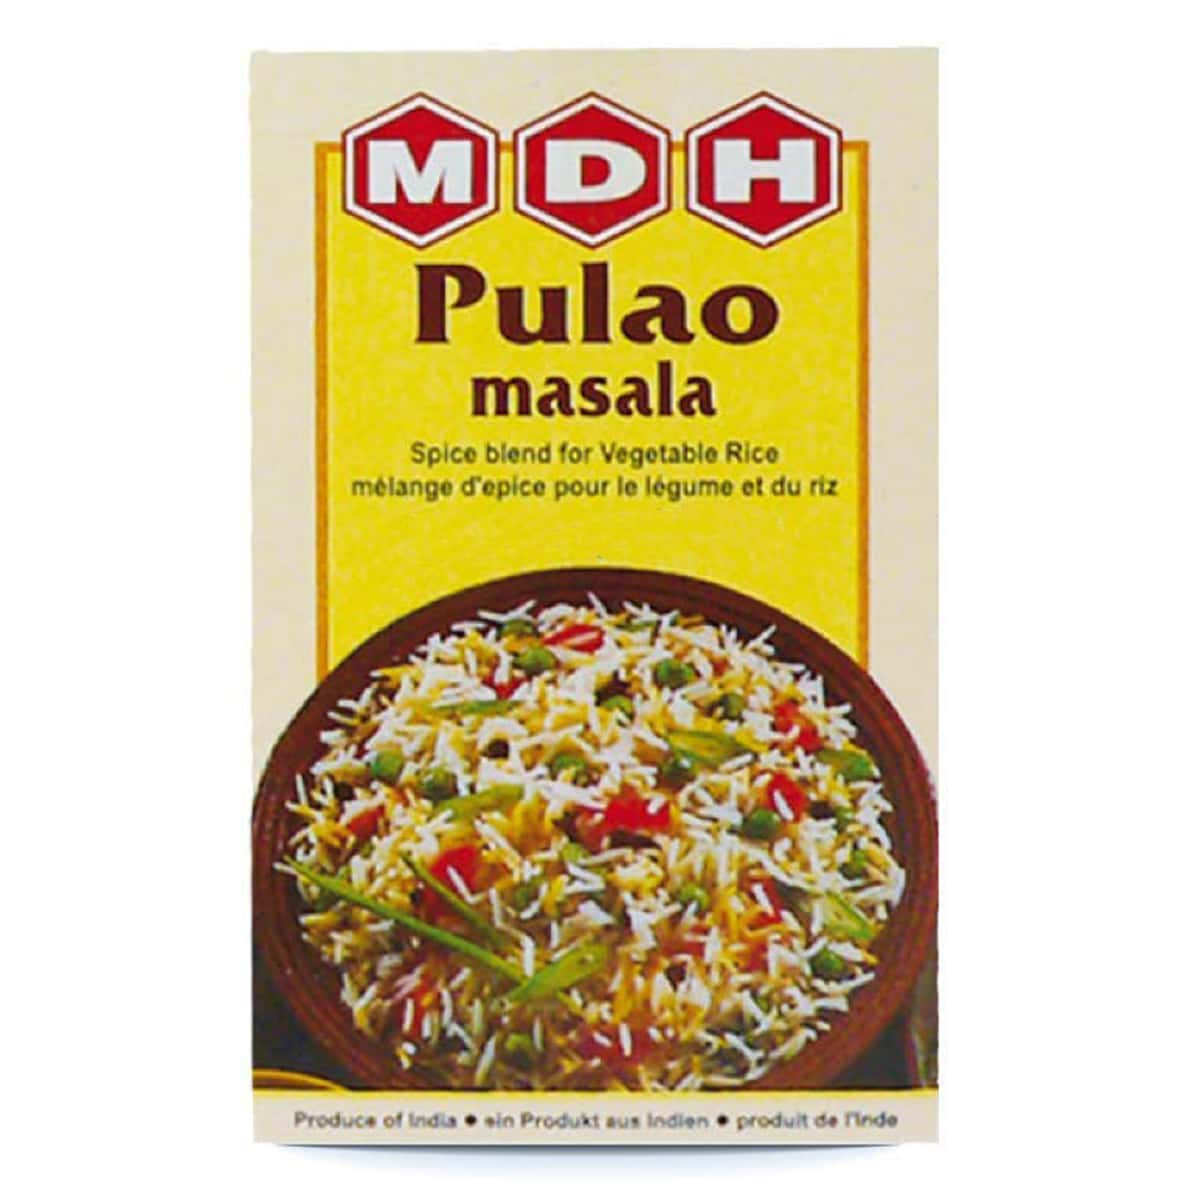 Buy MDH Pulao Masala - 100 gm